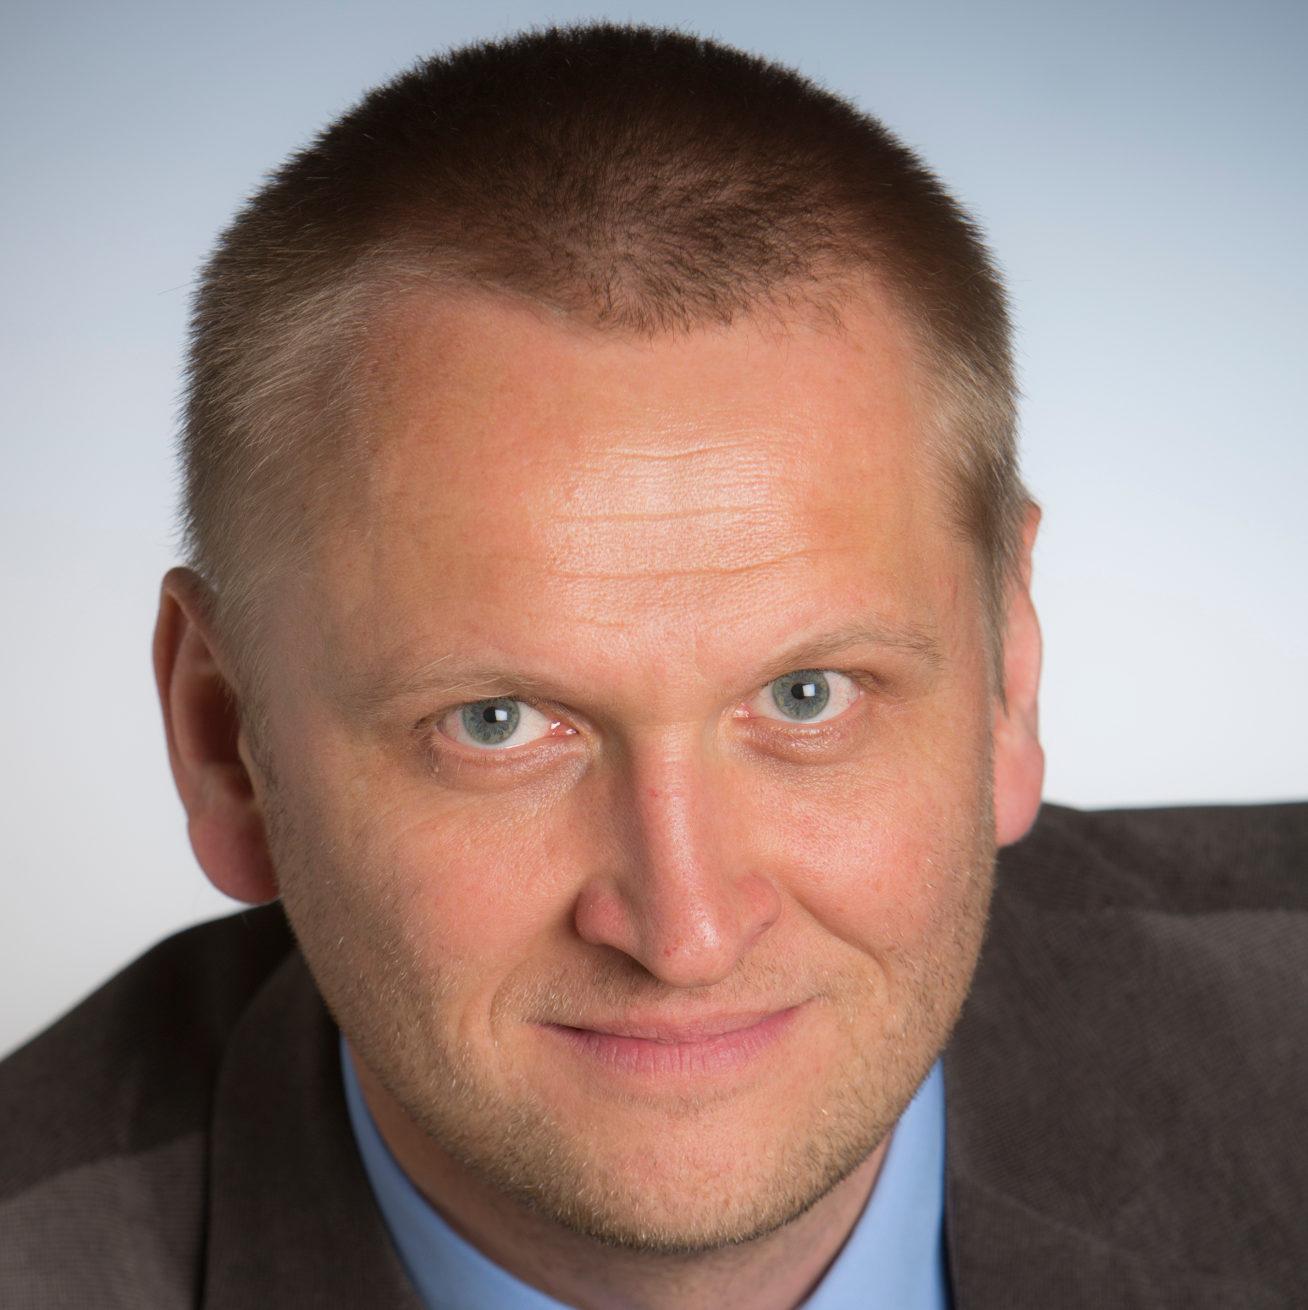 Gernot Müller-Putz, Ph.D.